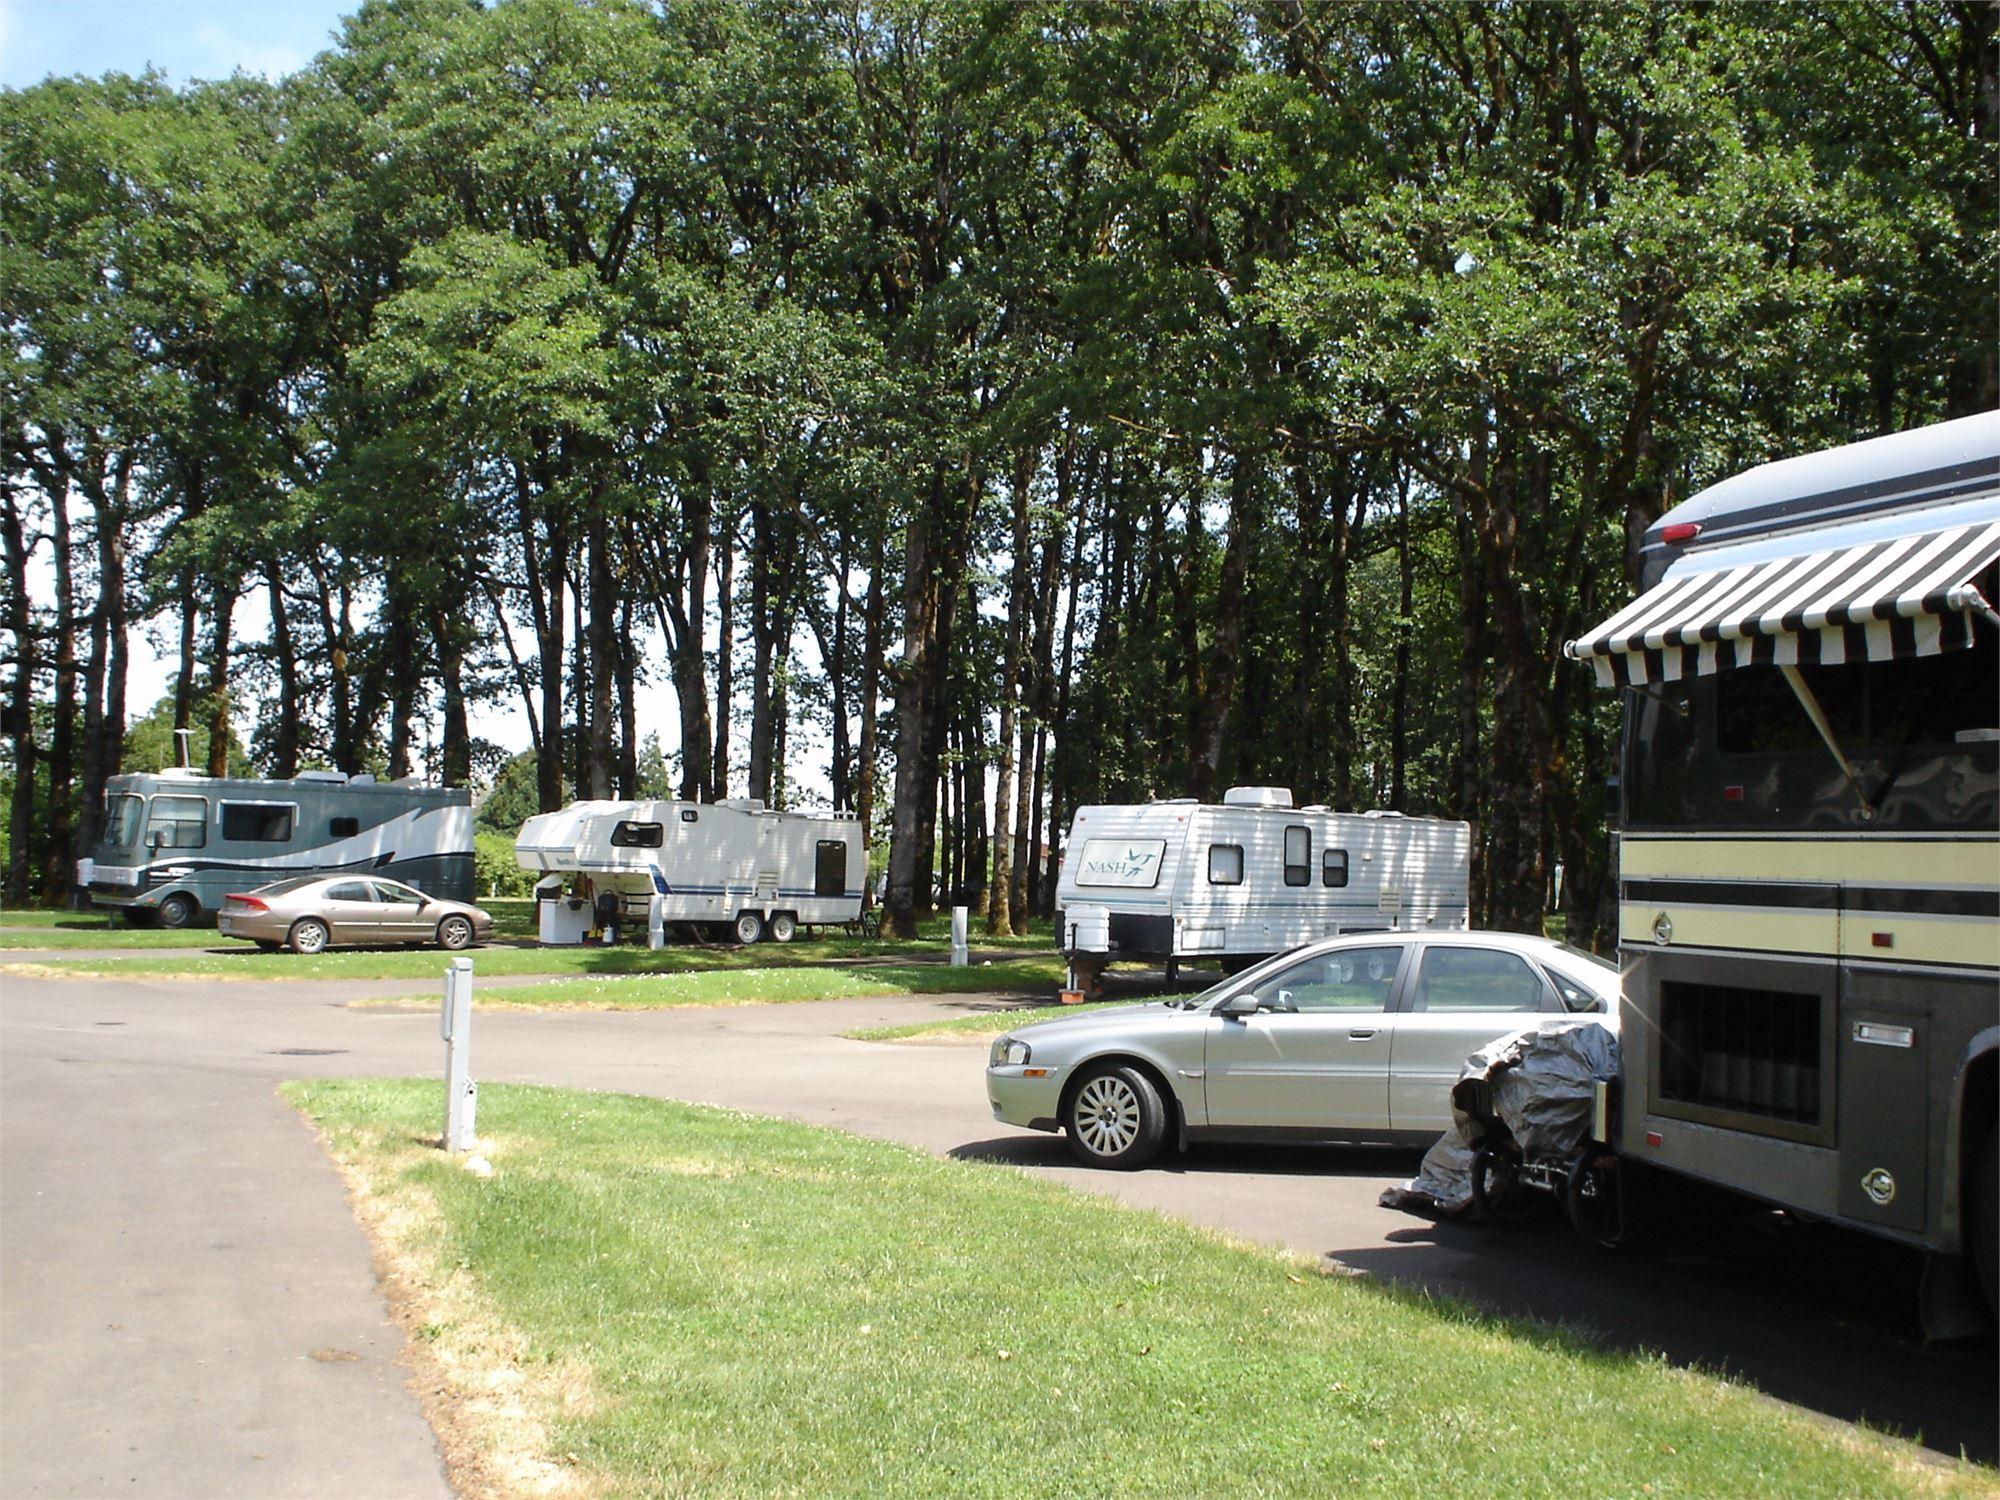 Full Hook up Camping Oregon rencontres webbplatser